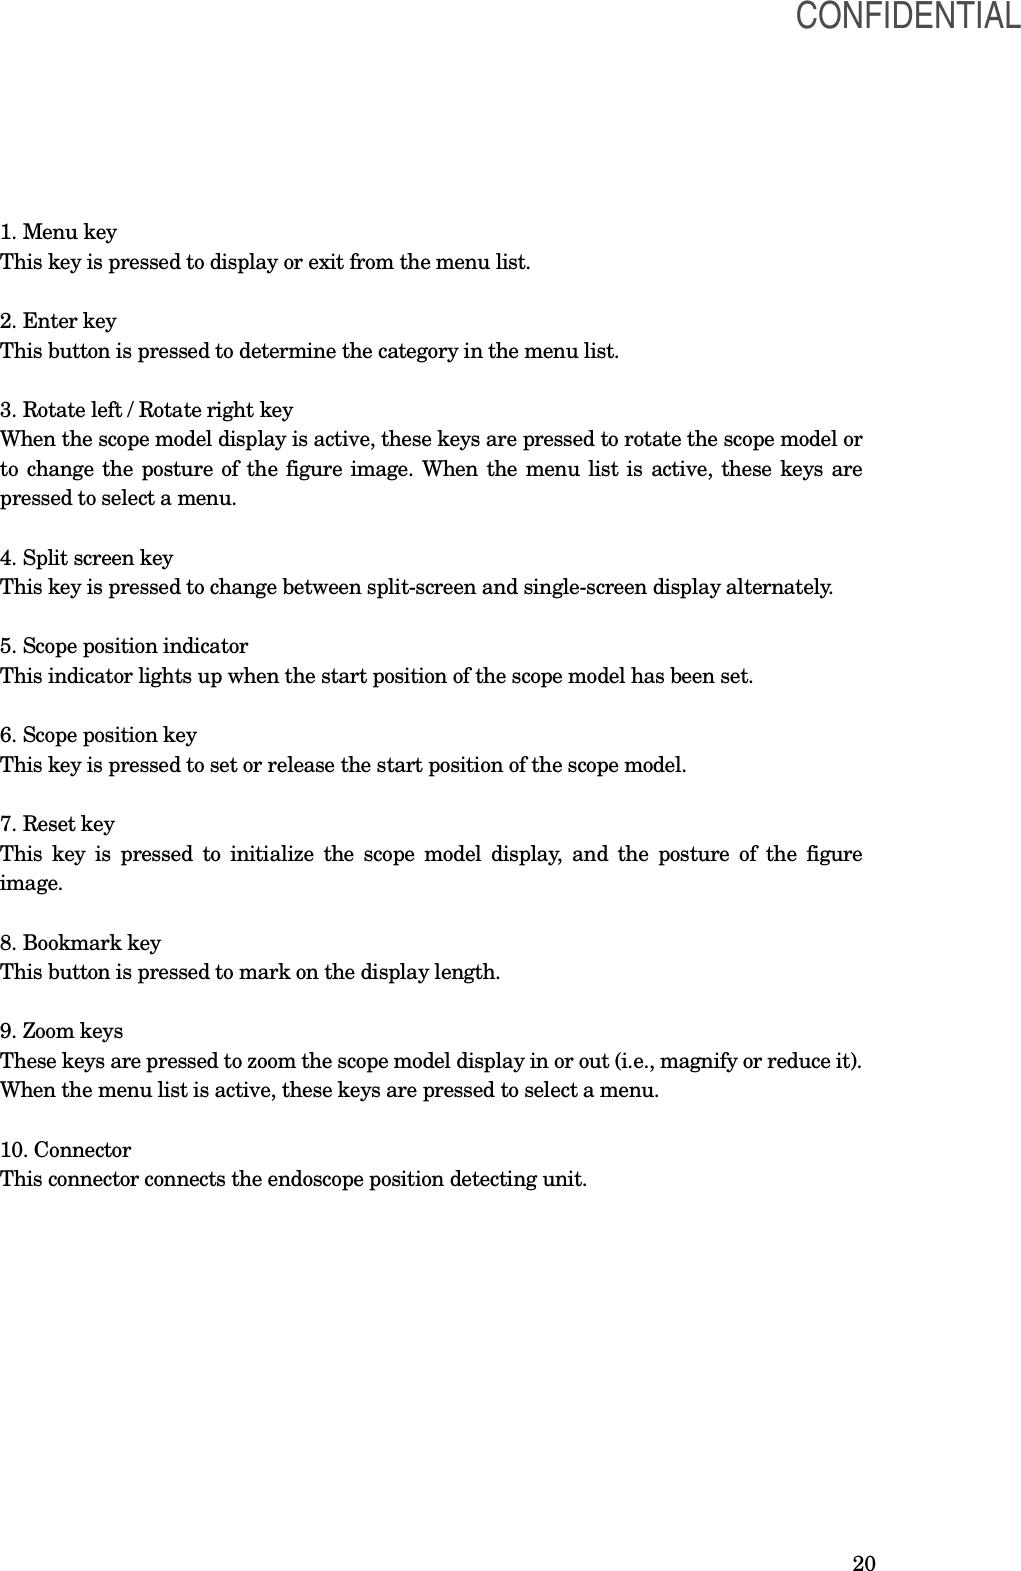 olympus om 10 instruction manual